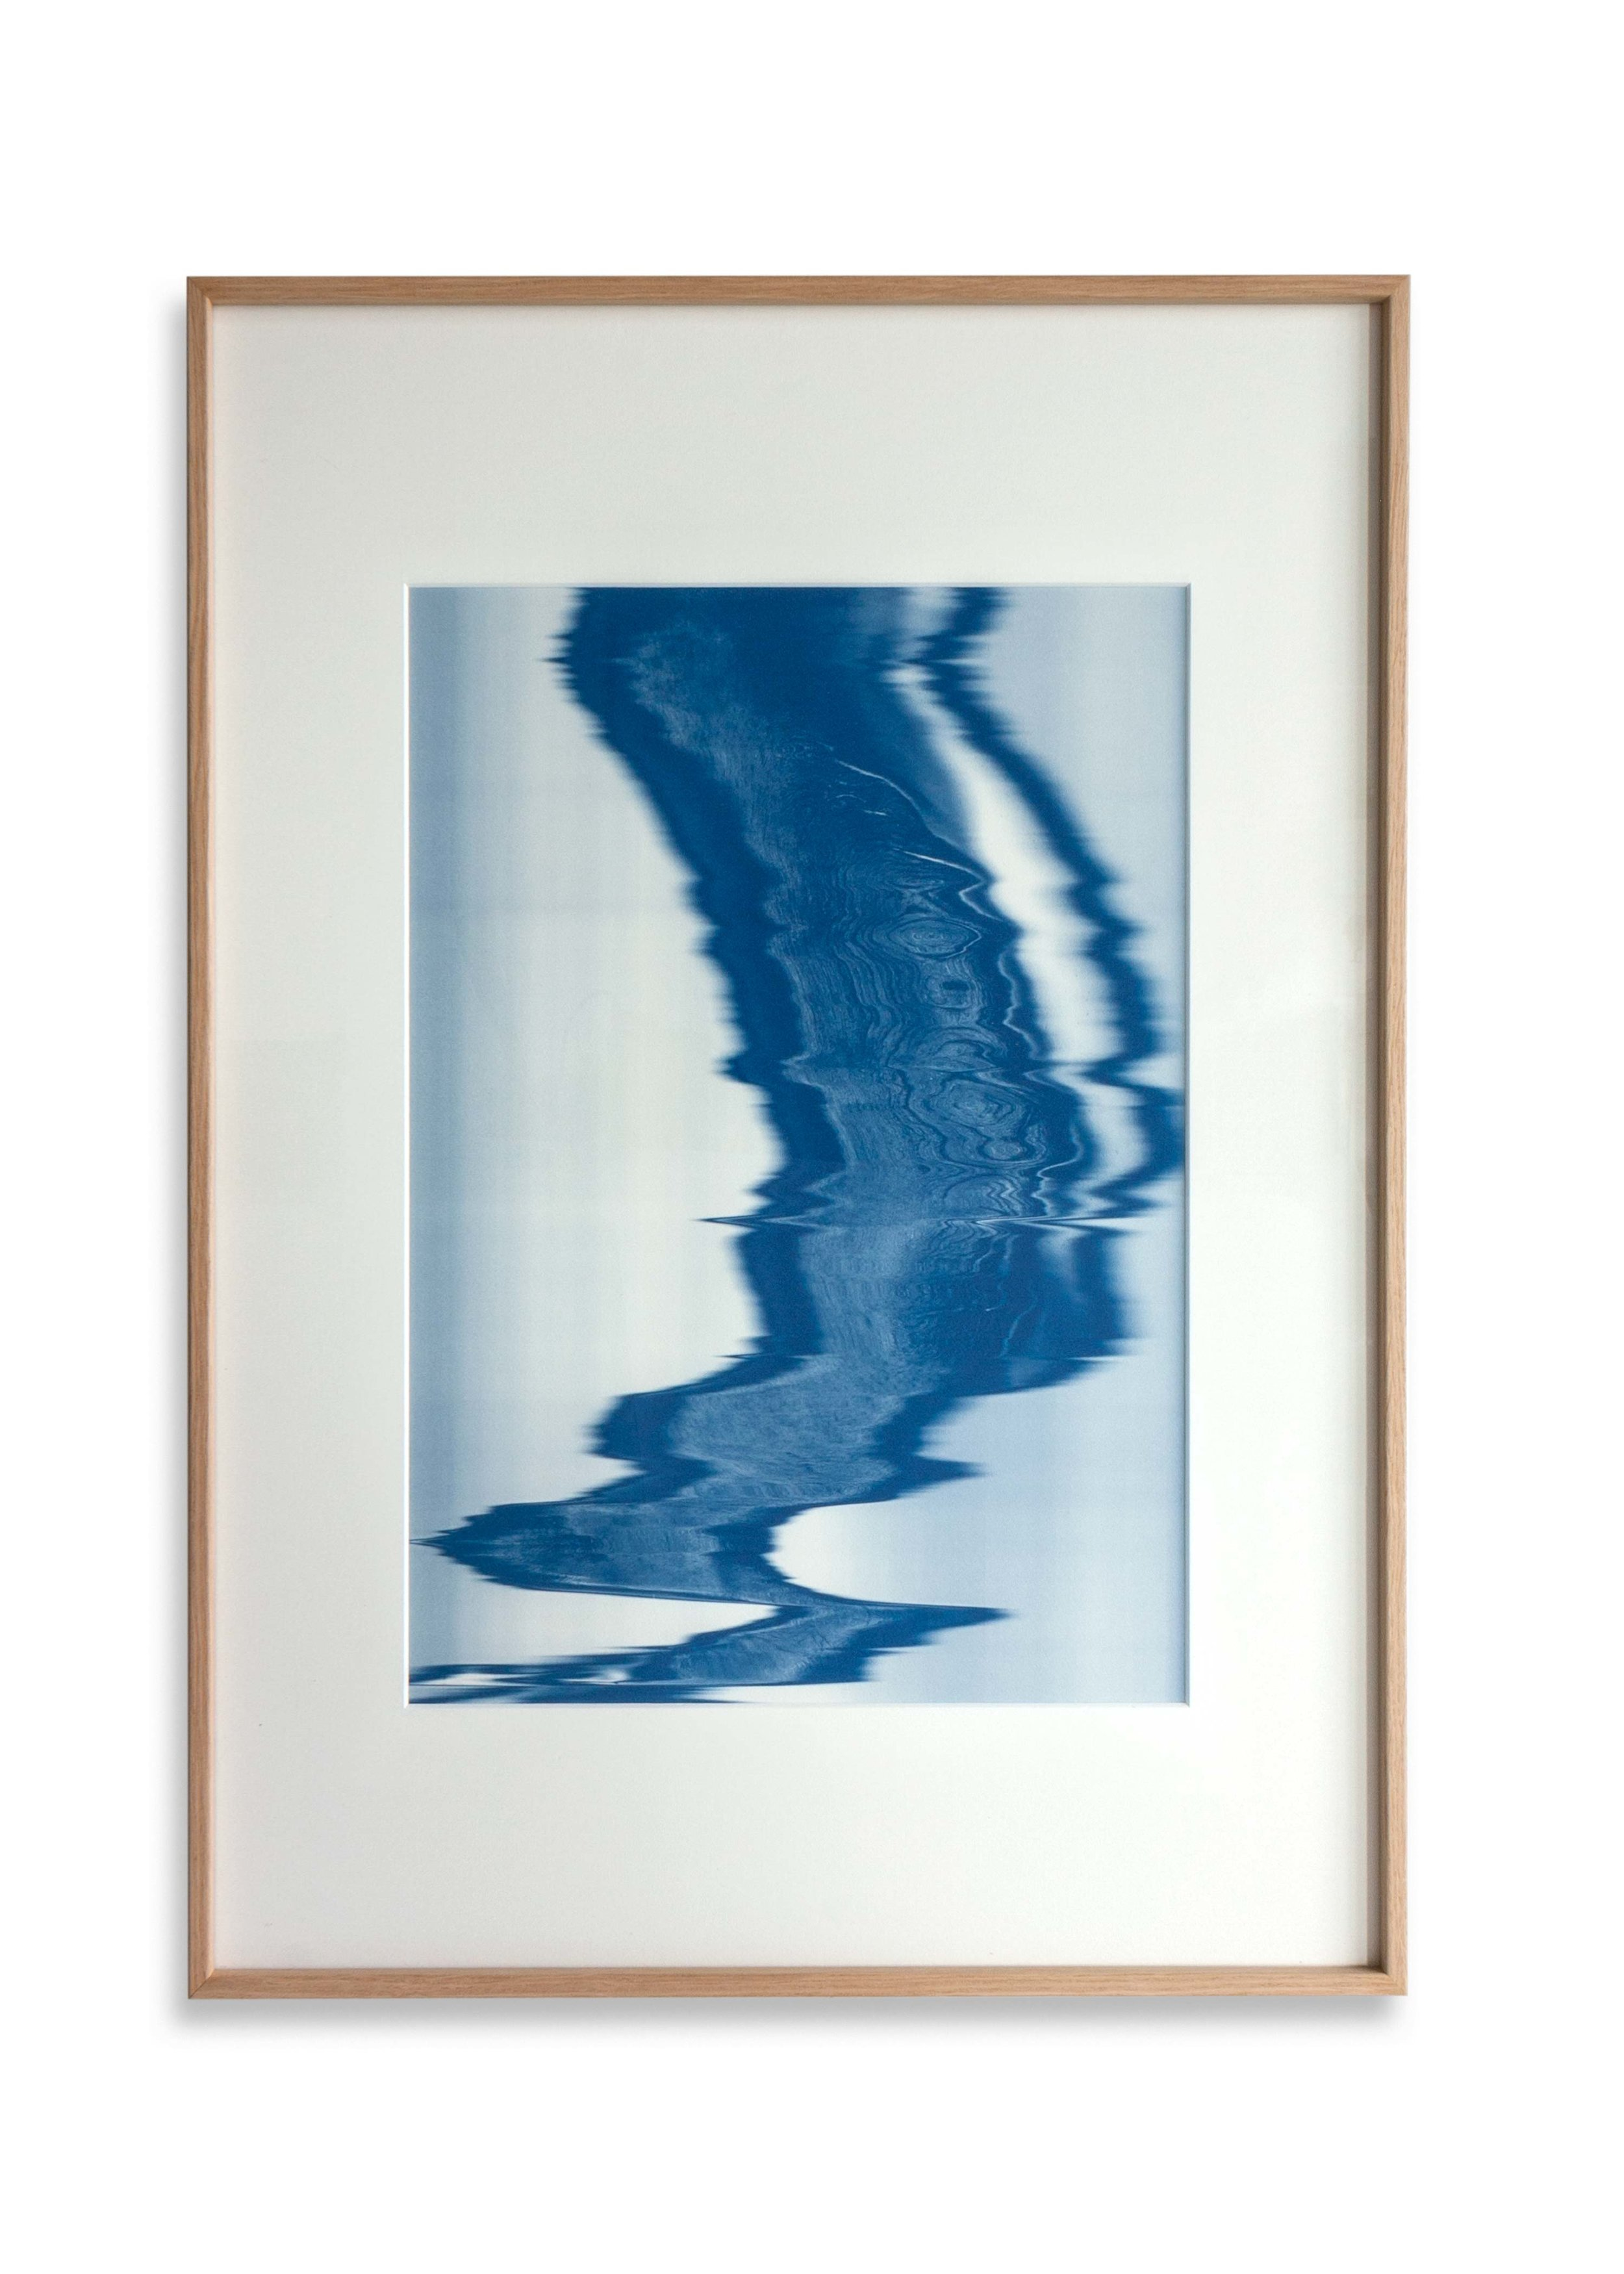 Trace Cumatilis XXX Print size 40 x 28cm / Frame size 54.9 x 42 cm Cyanotype Edition of 5